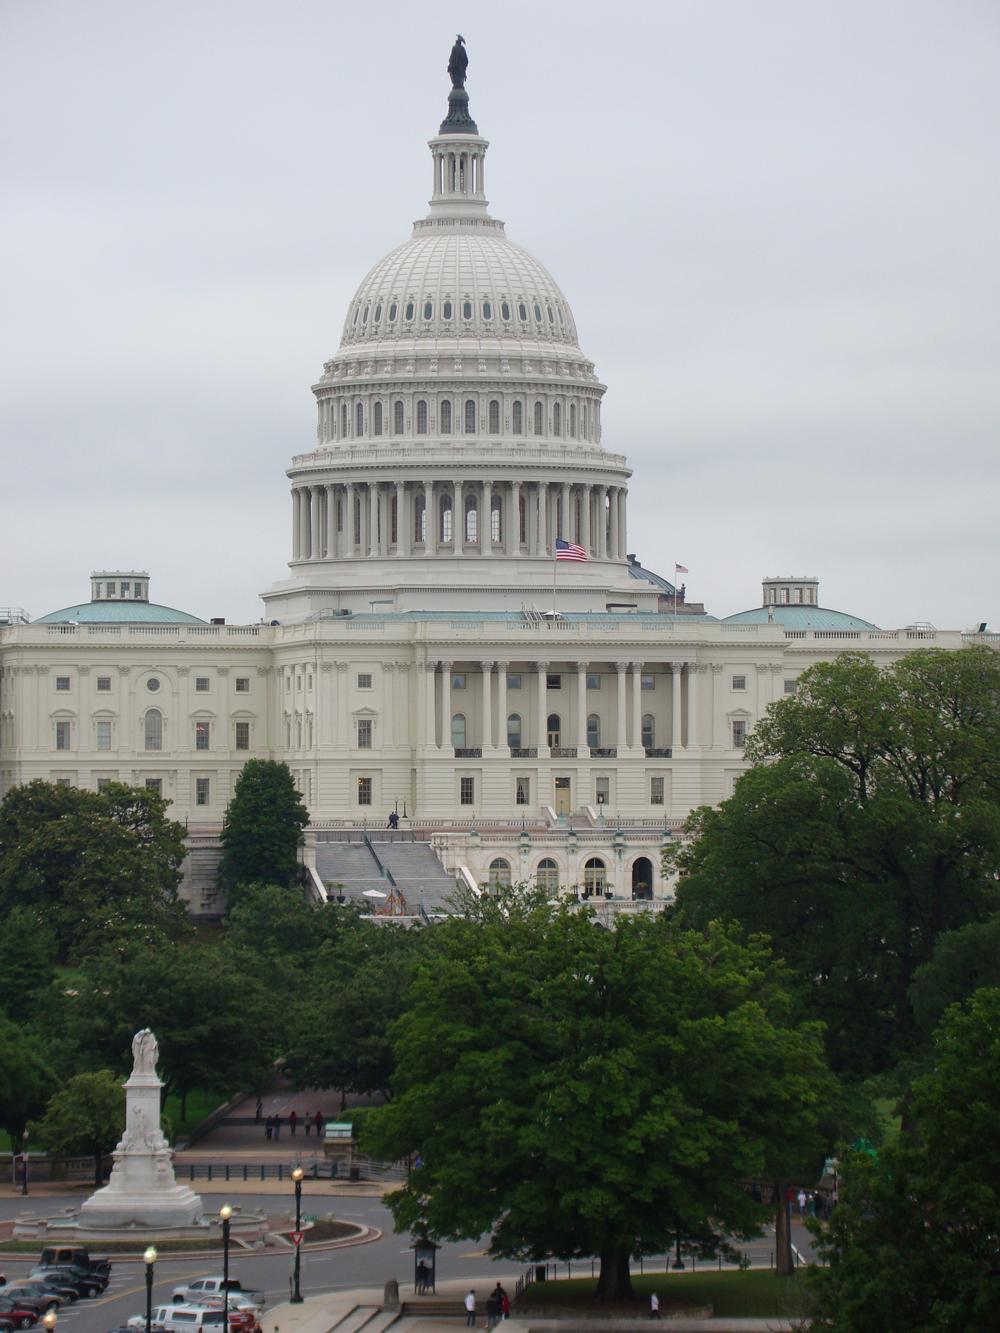 U.S. Capitol - Marble